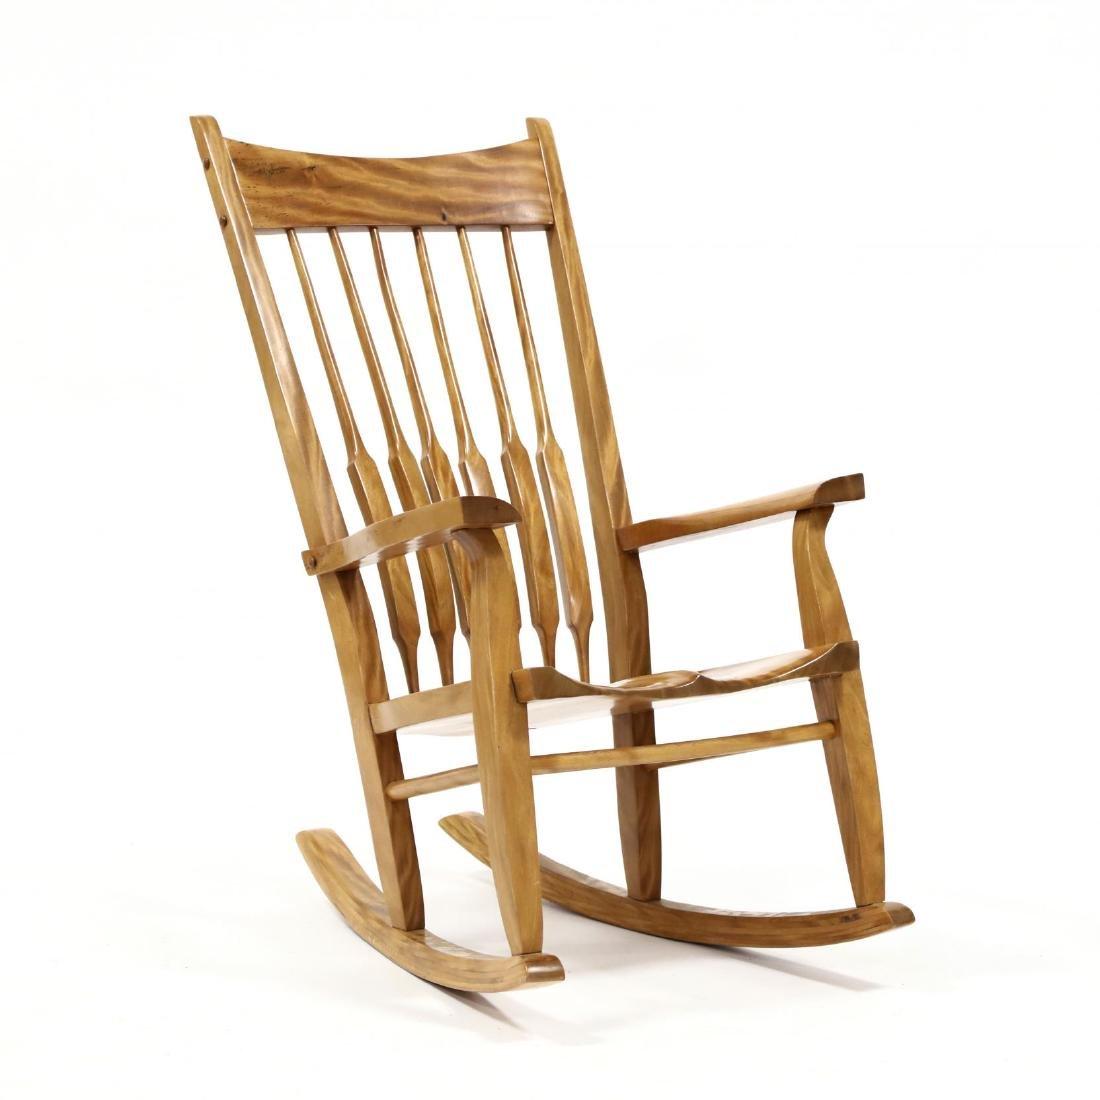 Randall Watkins, Koa Wood Rocking Chair